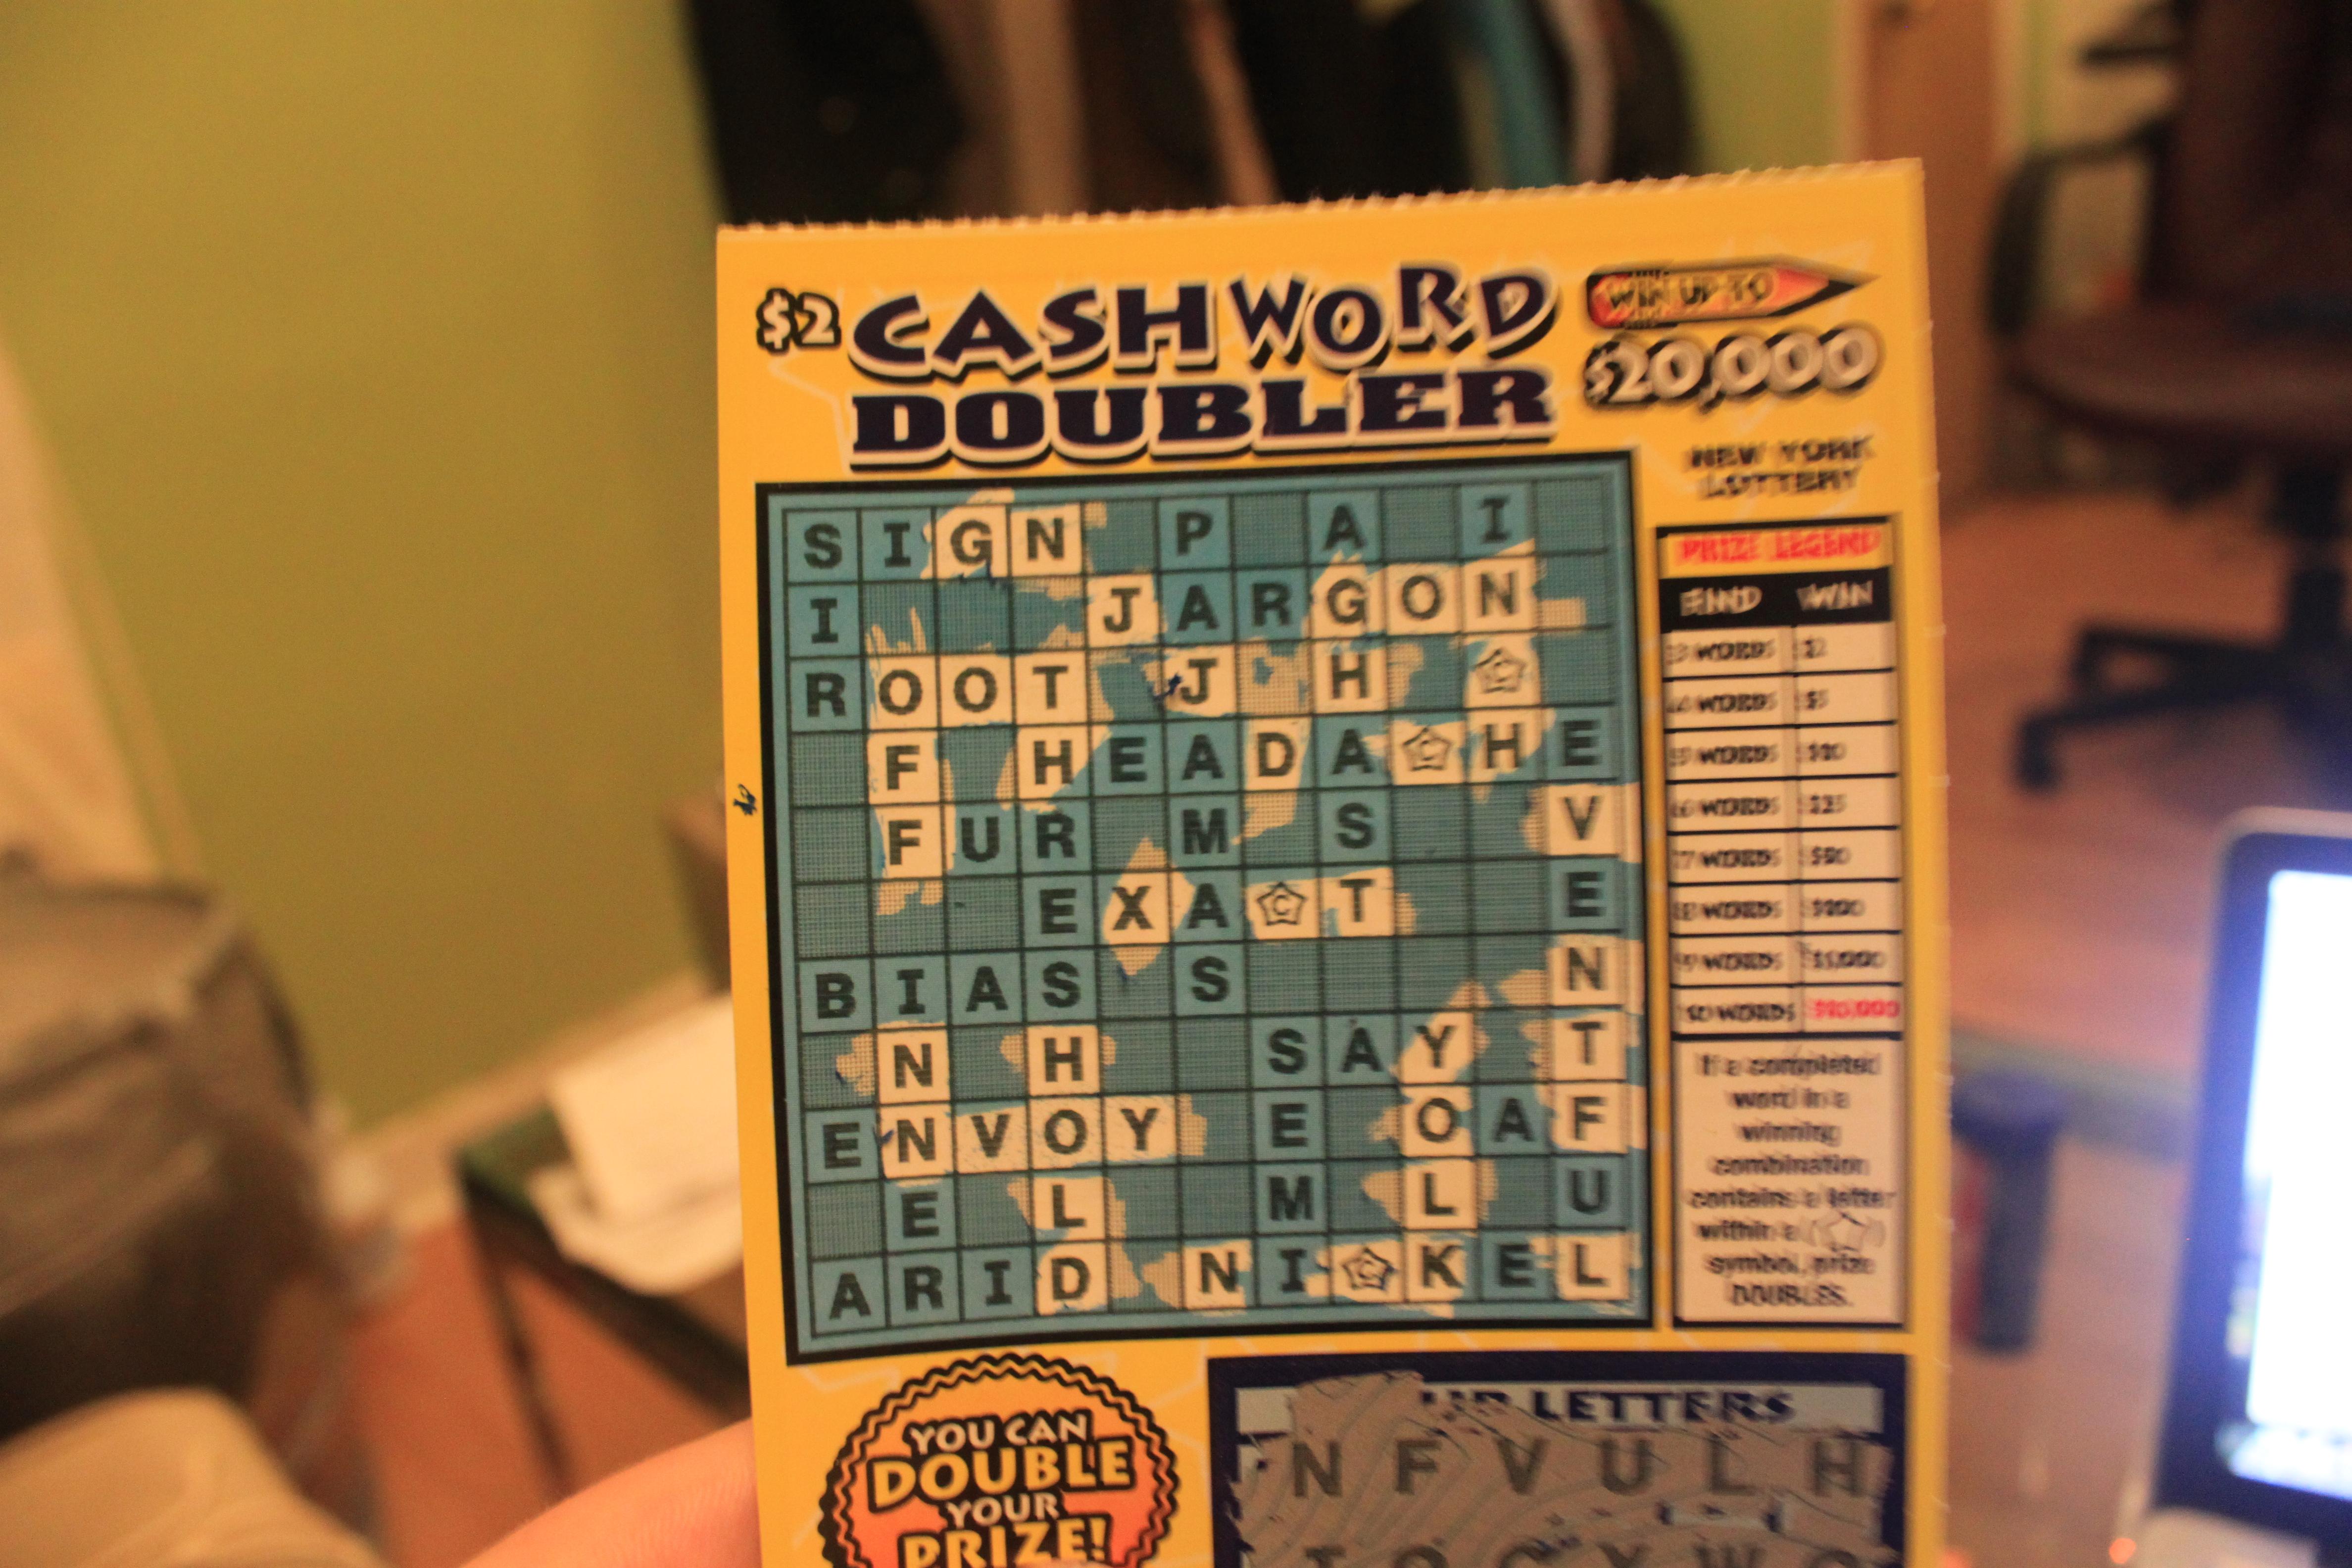 Cashword Doubler scratched off boxes